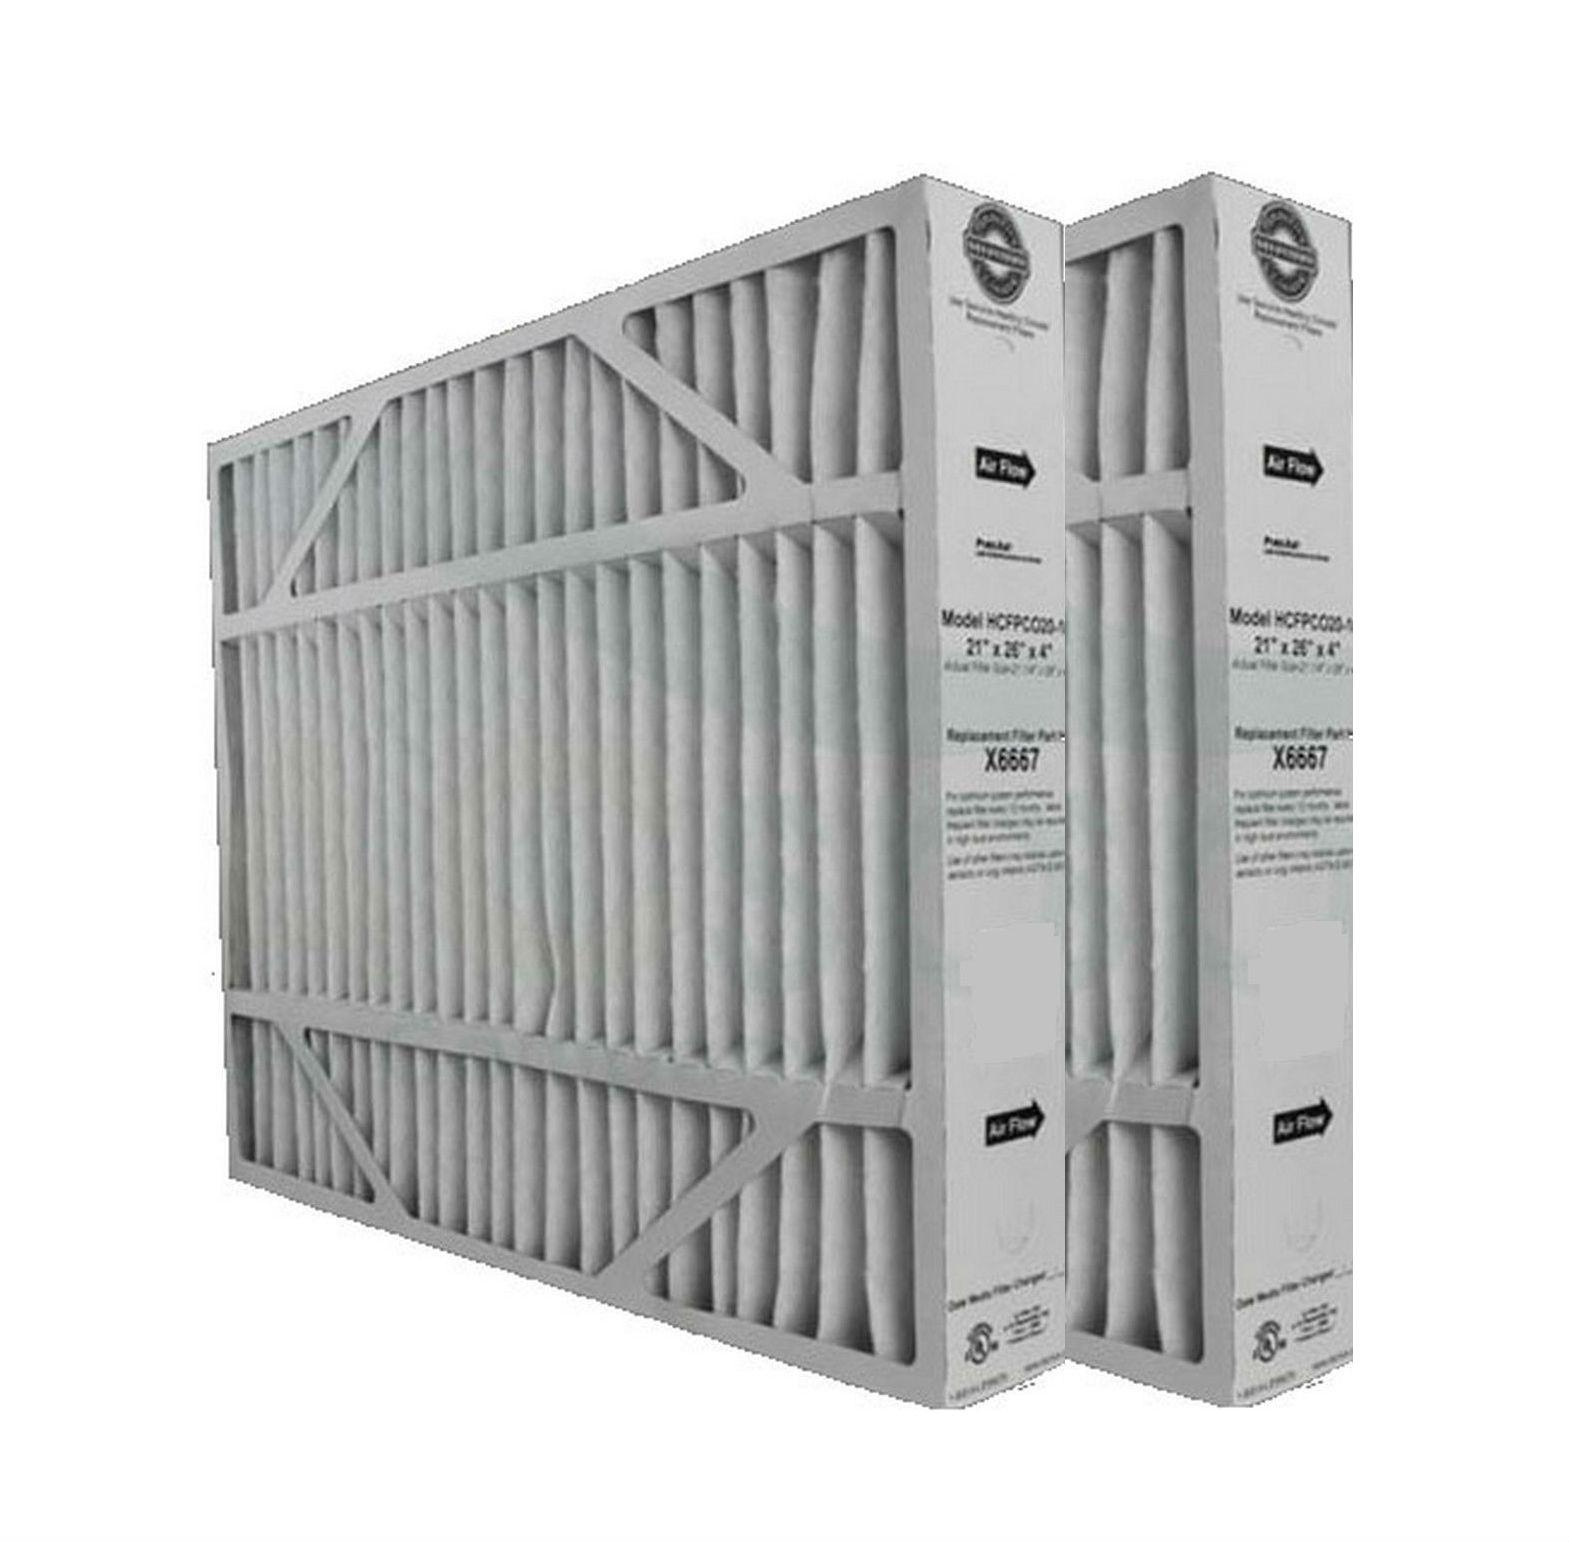 Lennox Healthy Climate MERV 11 Filter X6667 Filter 2 Pack